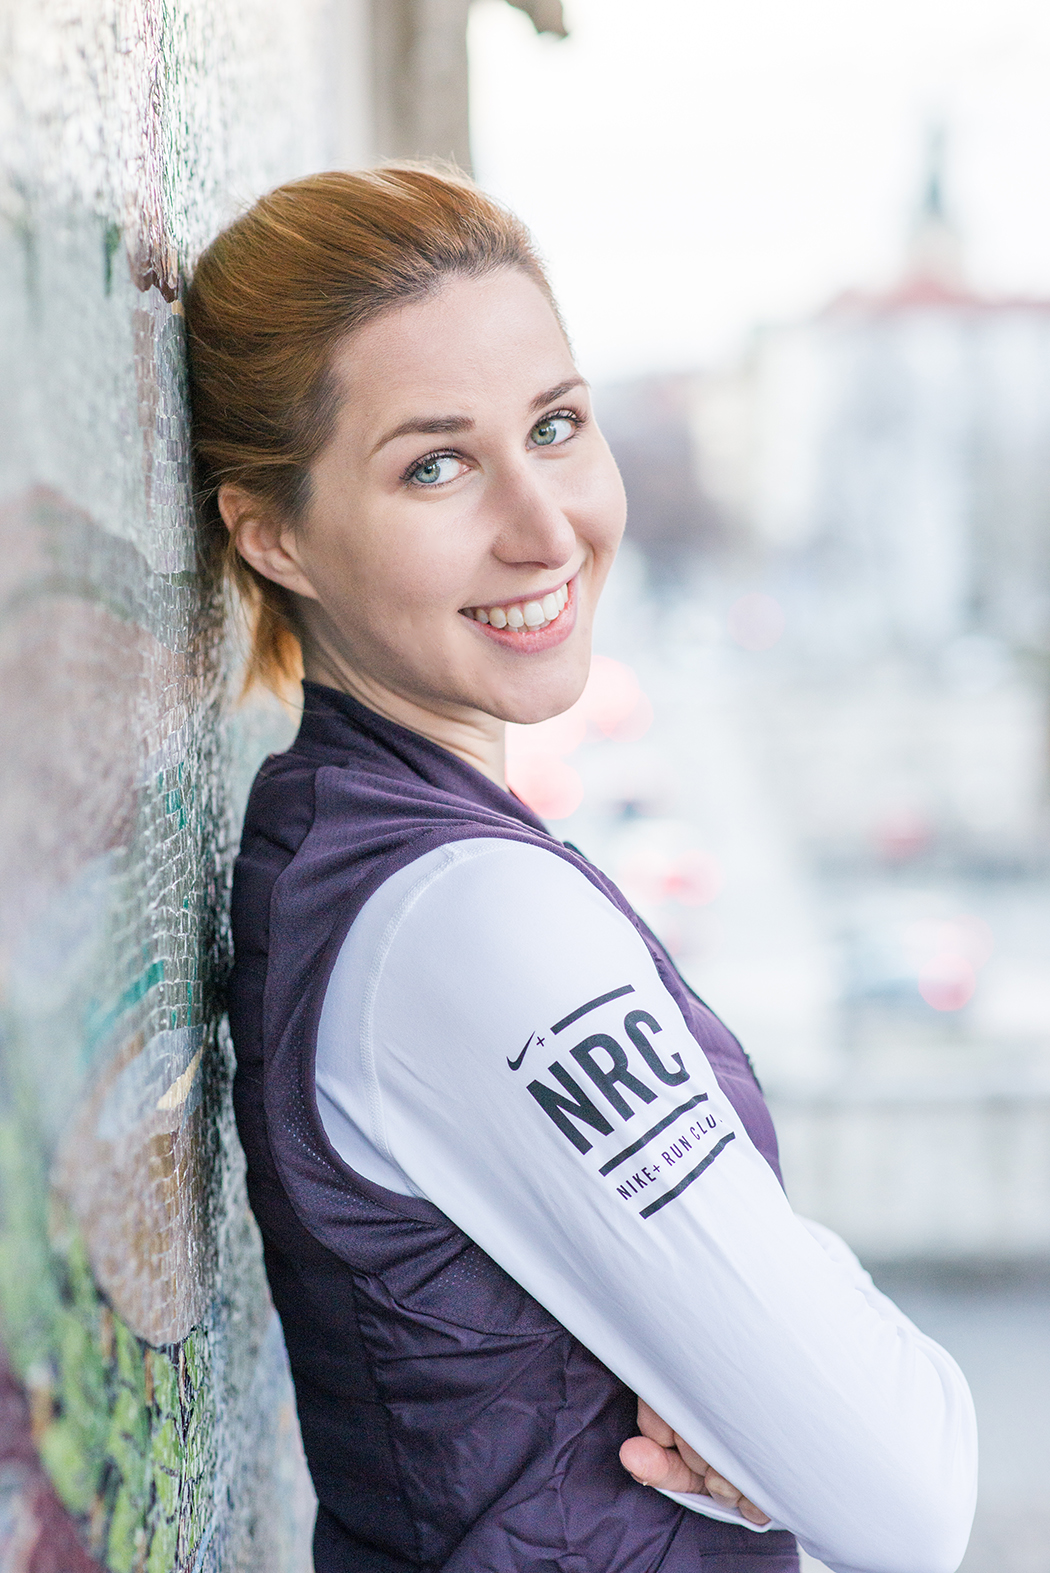 Fitnessblog-Fitnessblogger-Fitness-Blog-Blogger-Running-Nike-Hyperwarm-NRC-Munich-Runner-9-web